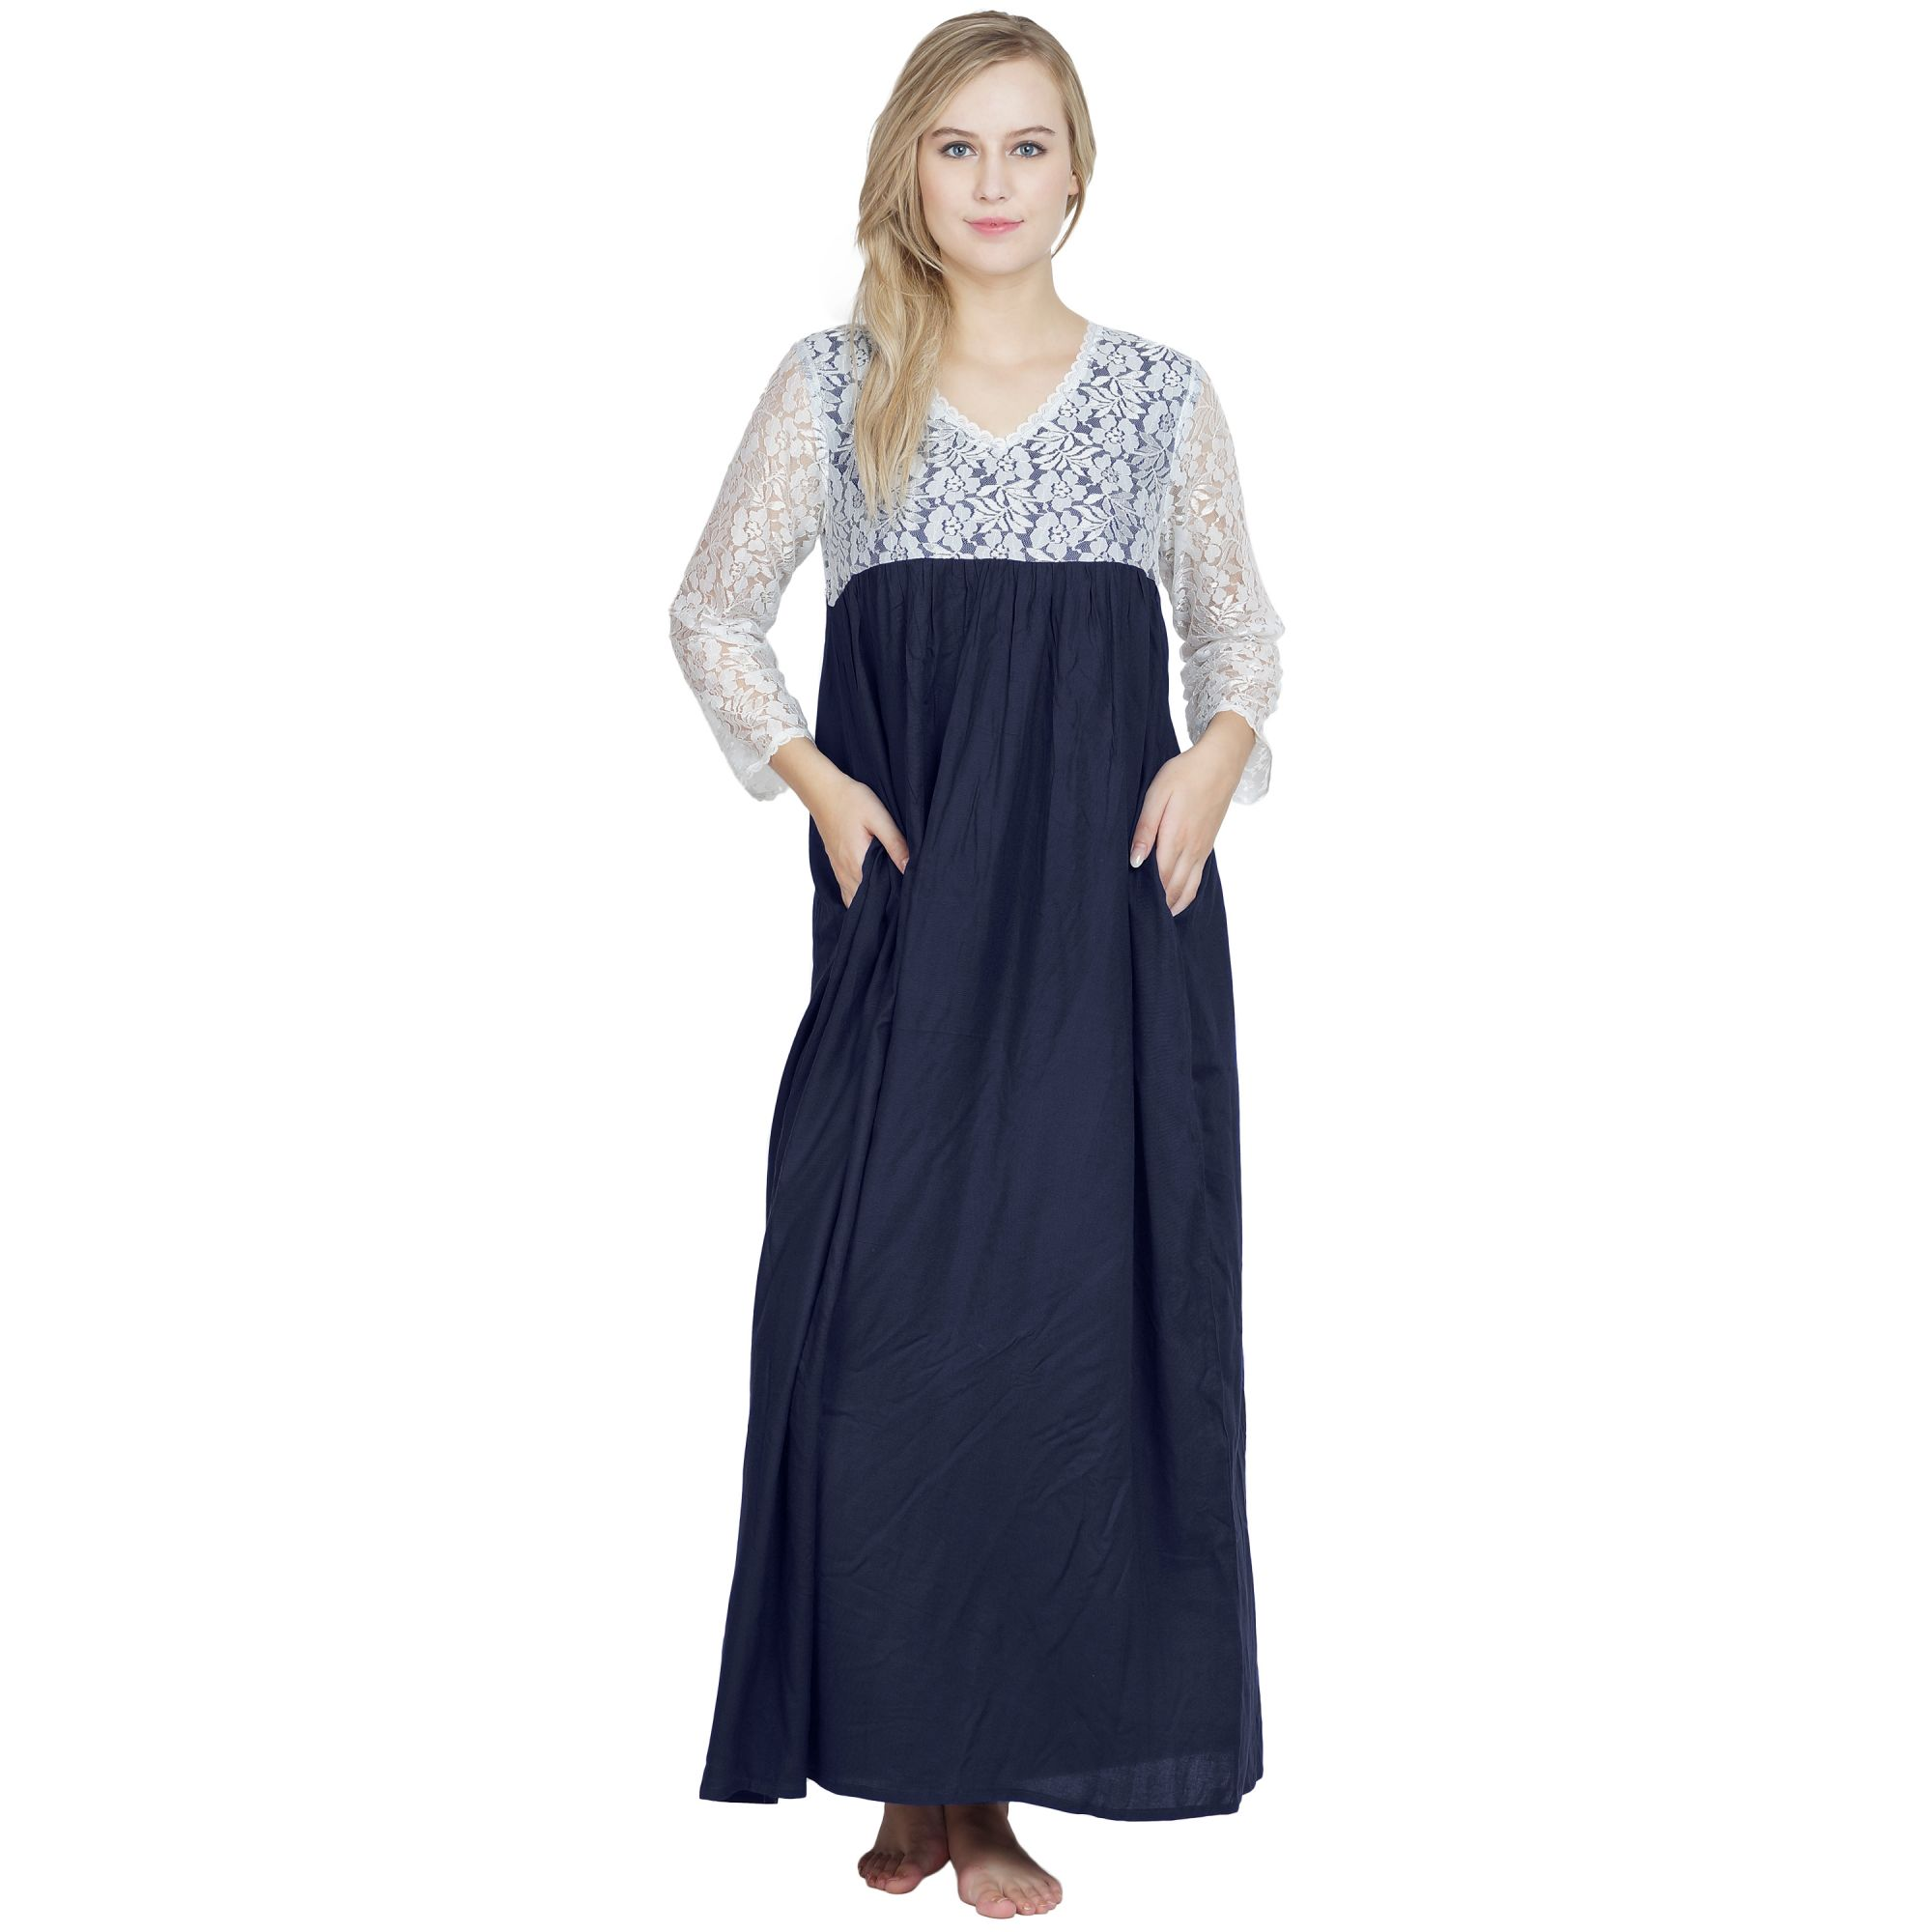 Lace Blouson Maxi Dress in Dark Blue